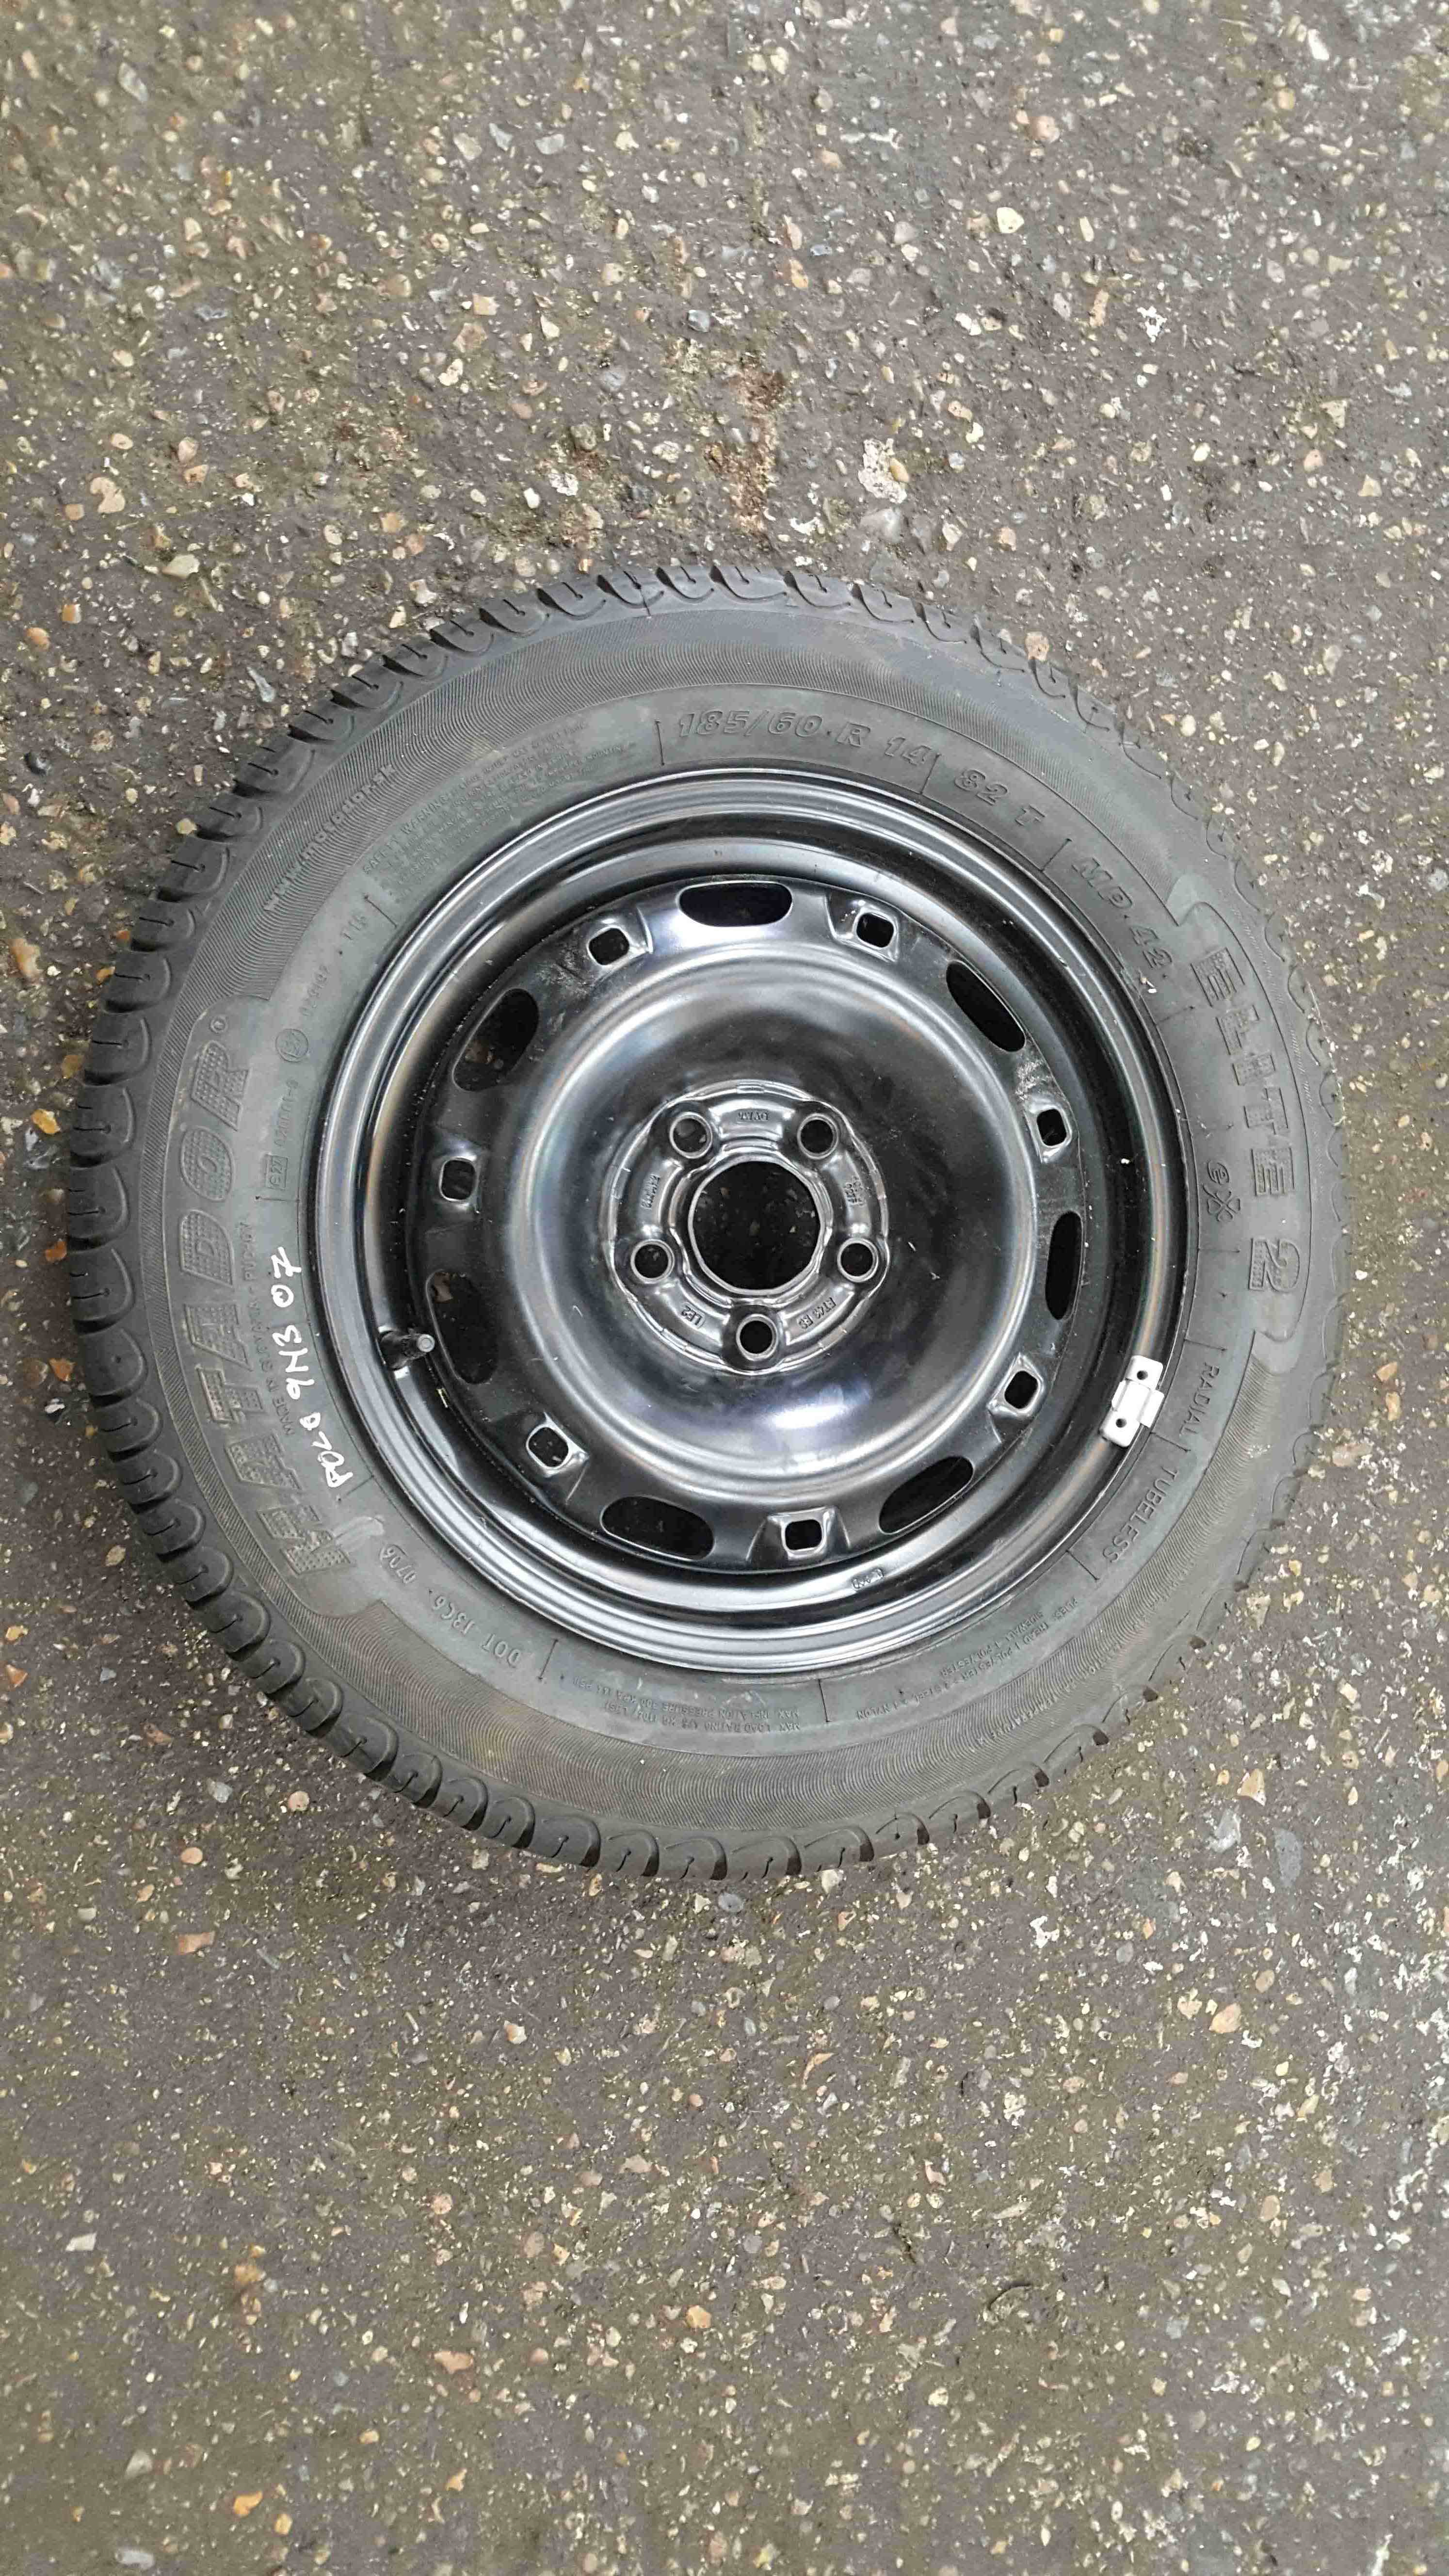 Volkswagen Polo 9N3 2006-2008 Steel Wheel Rim + Tyre 185 60 14 8mm 4/5